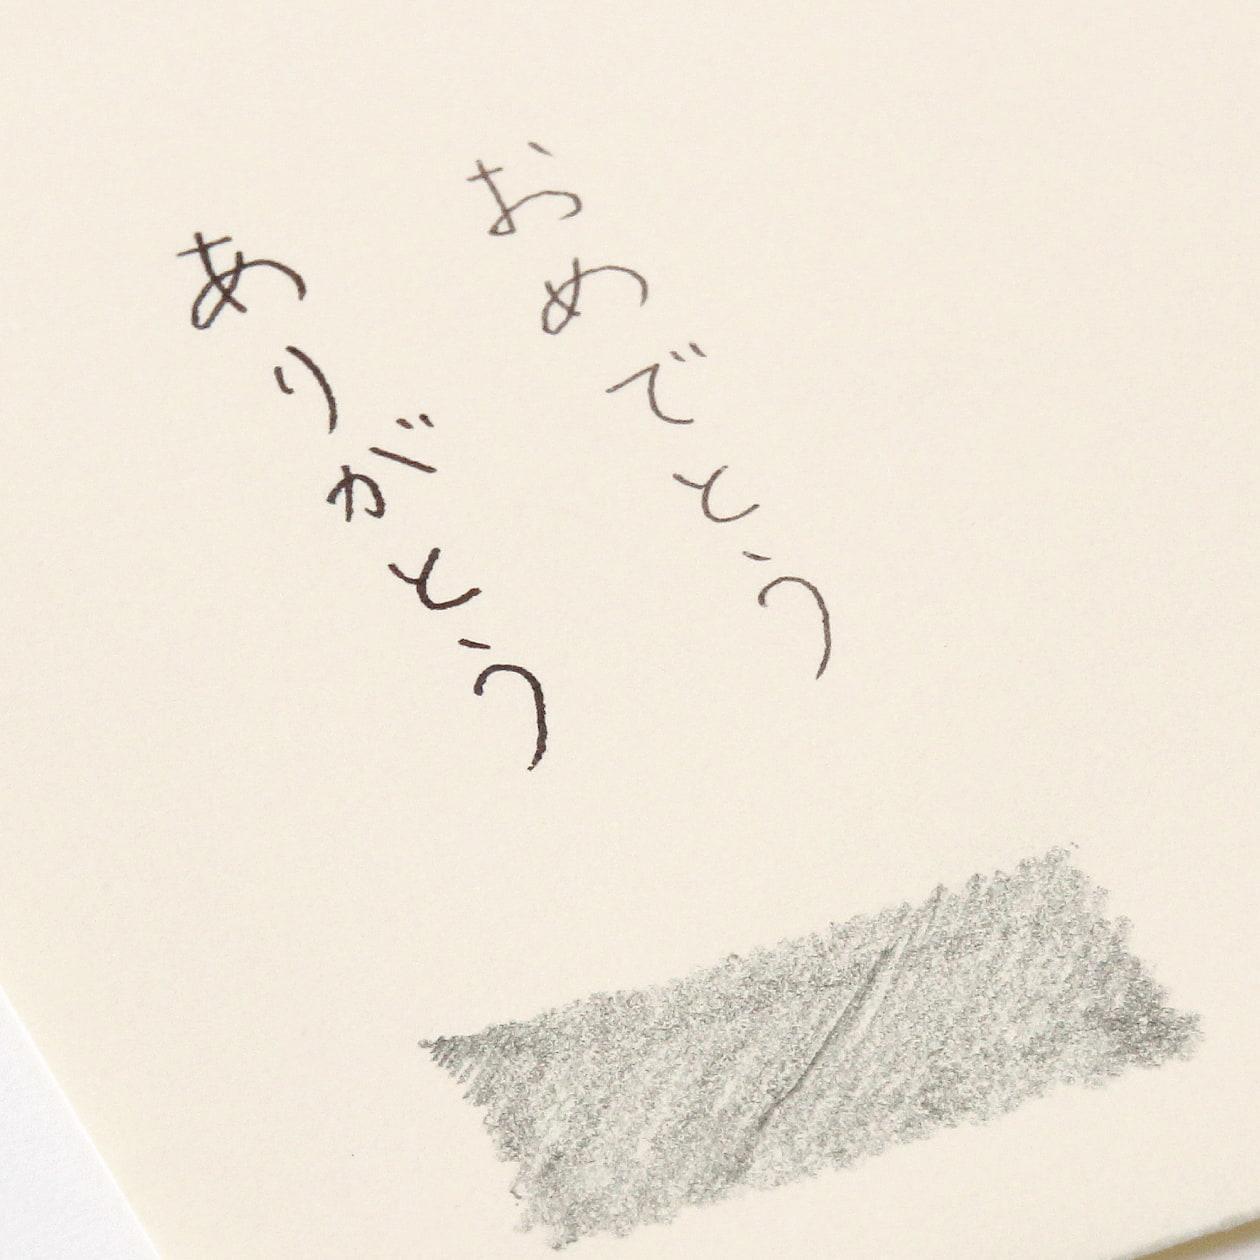 No.57ボーダード A4シート ピスタチオ 116.3g